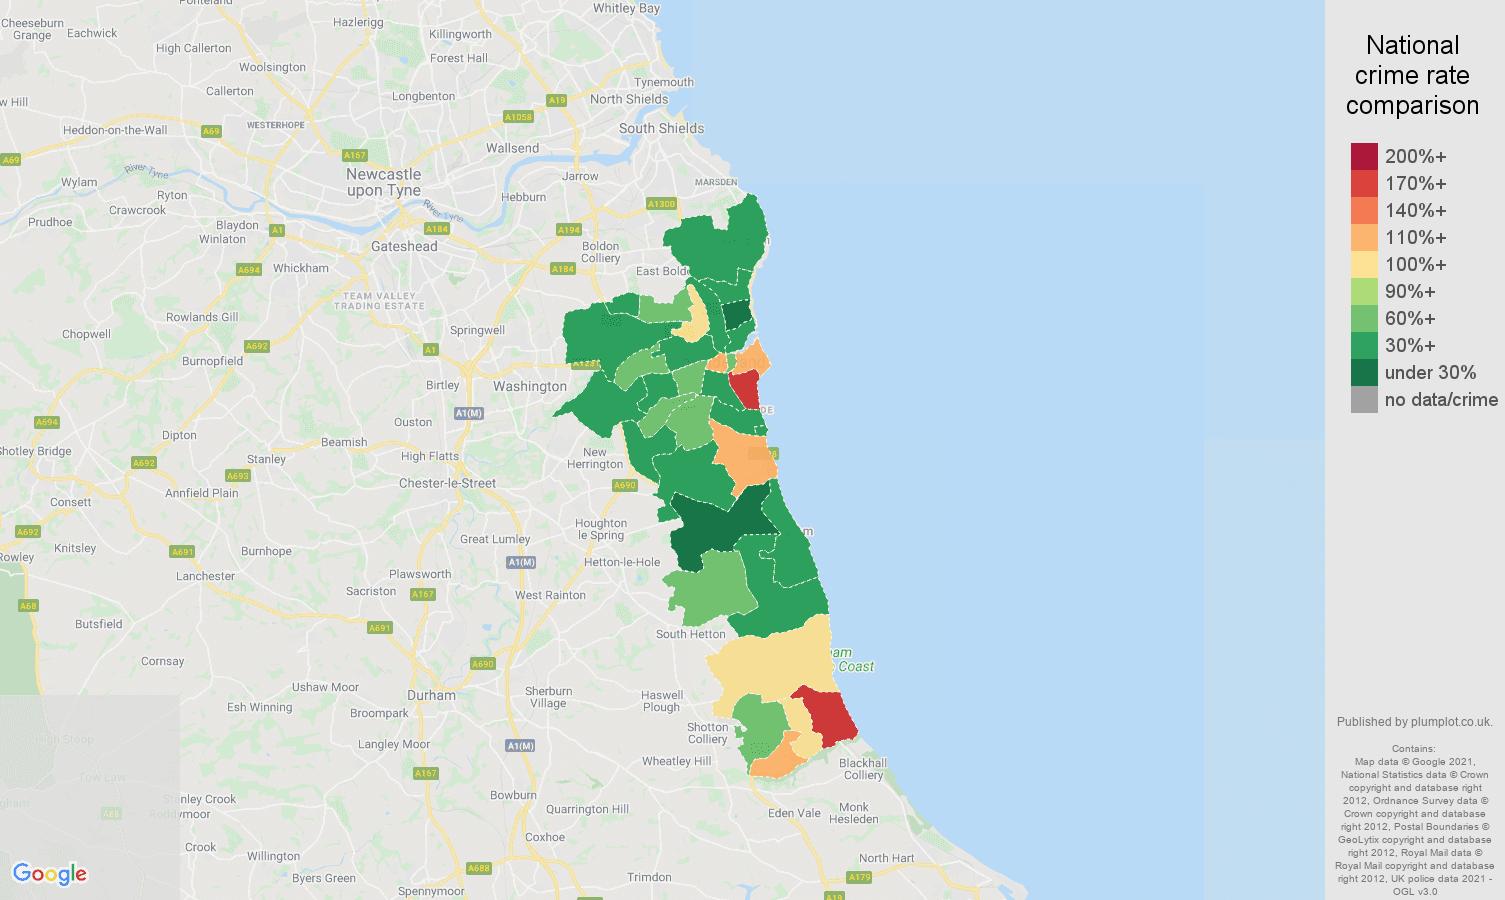 Sunderland drugs crime rate comparison map